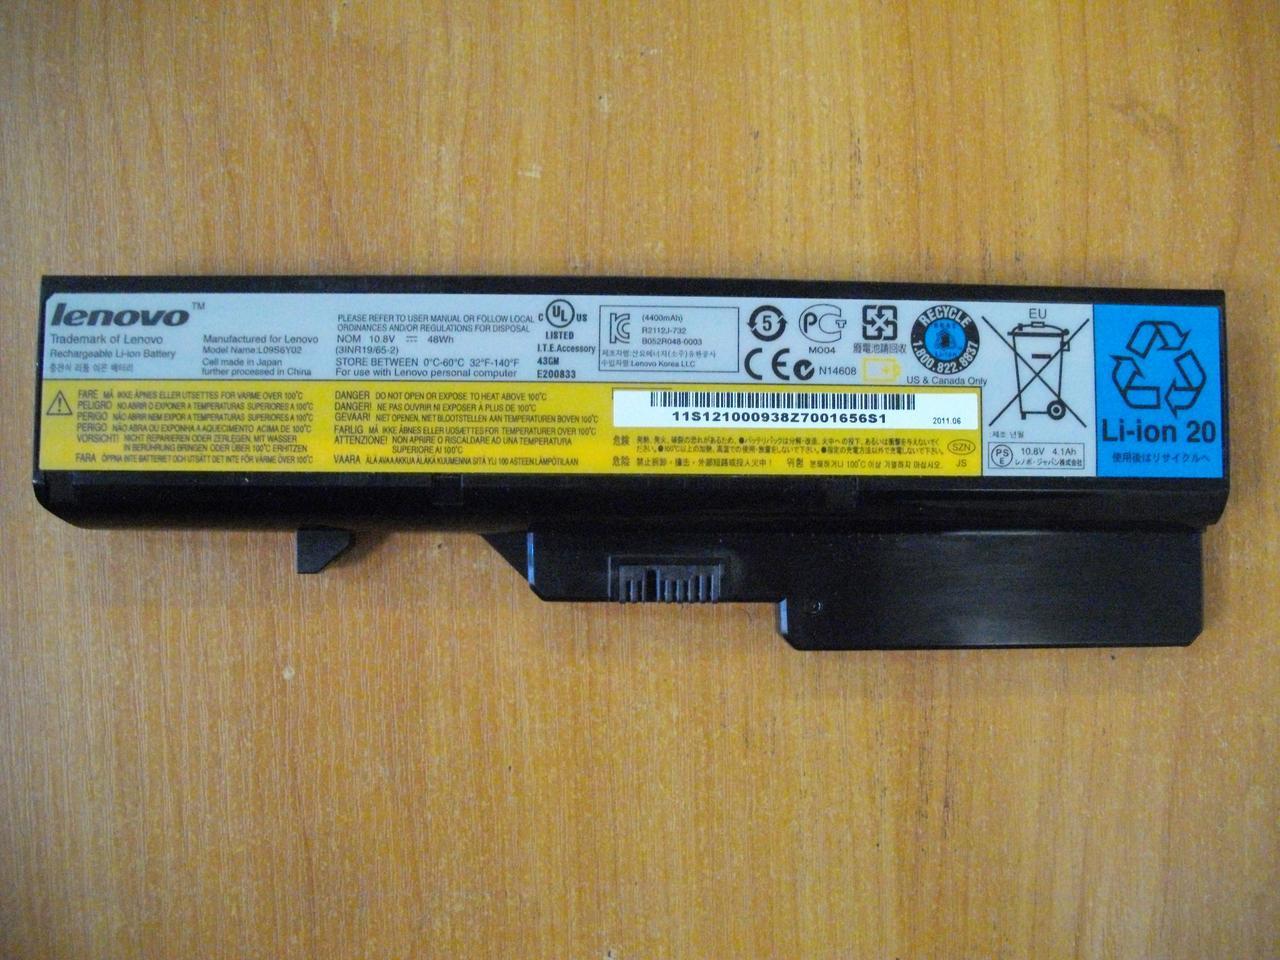 АКБ Батарея Аккумулятор Оригинальная L09S6Y02 Lenovo G565 БУ